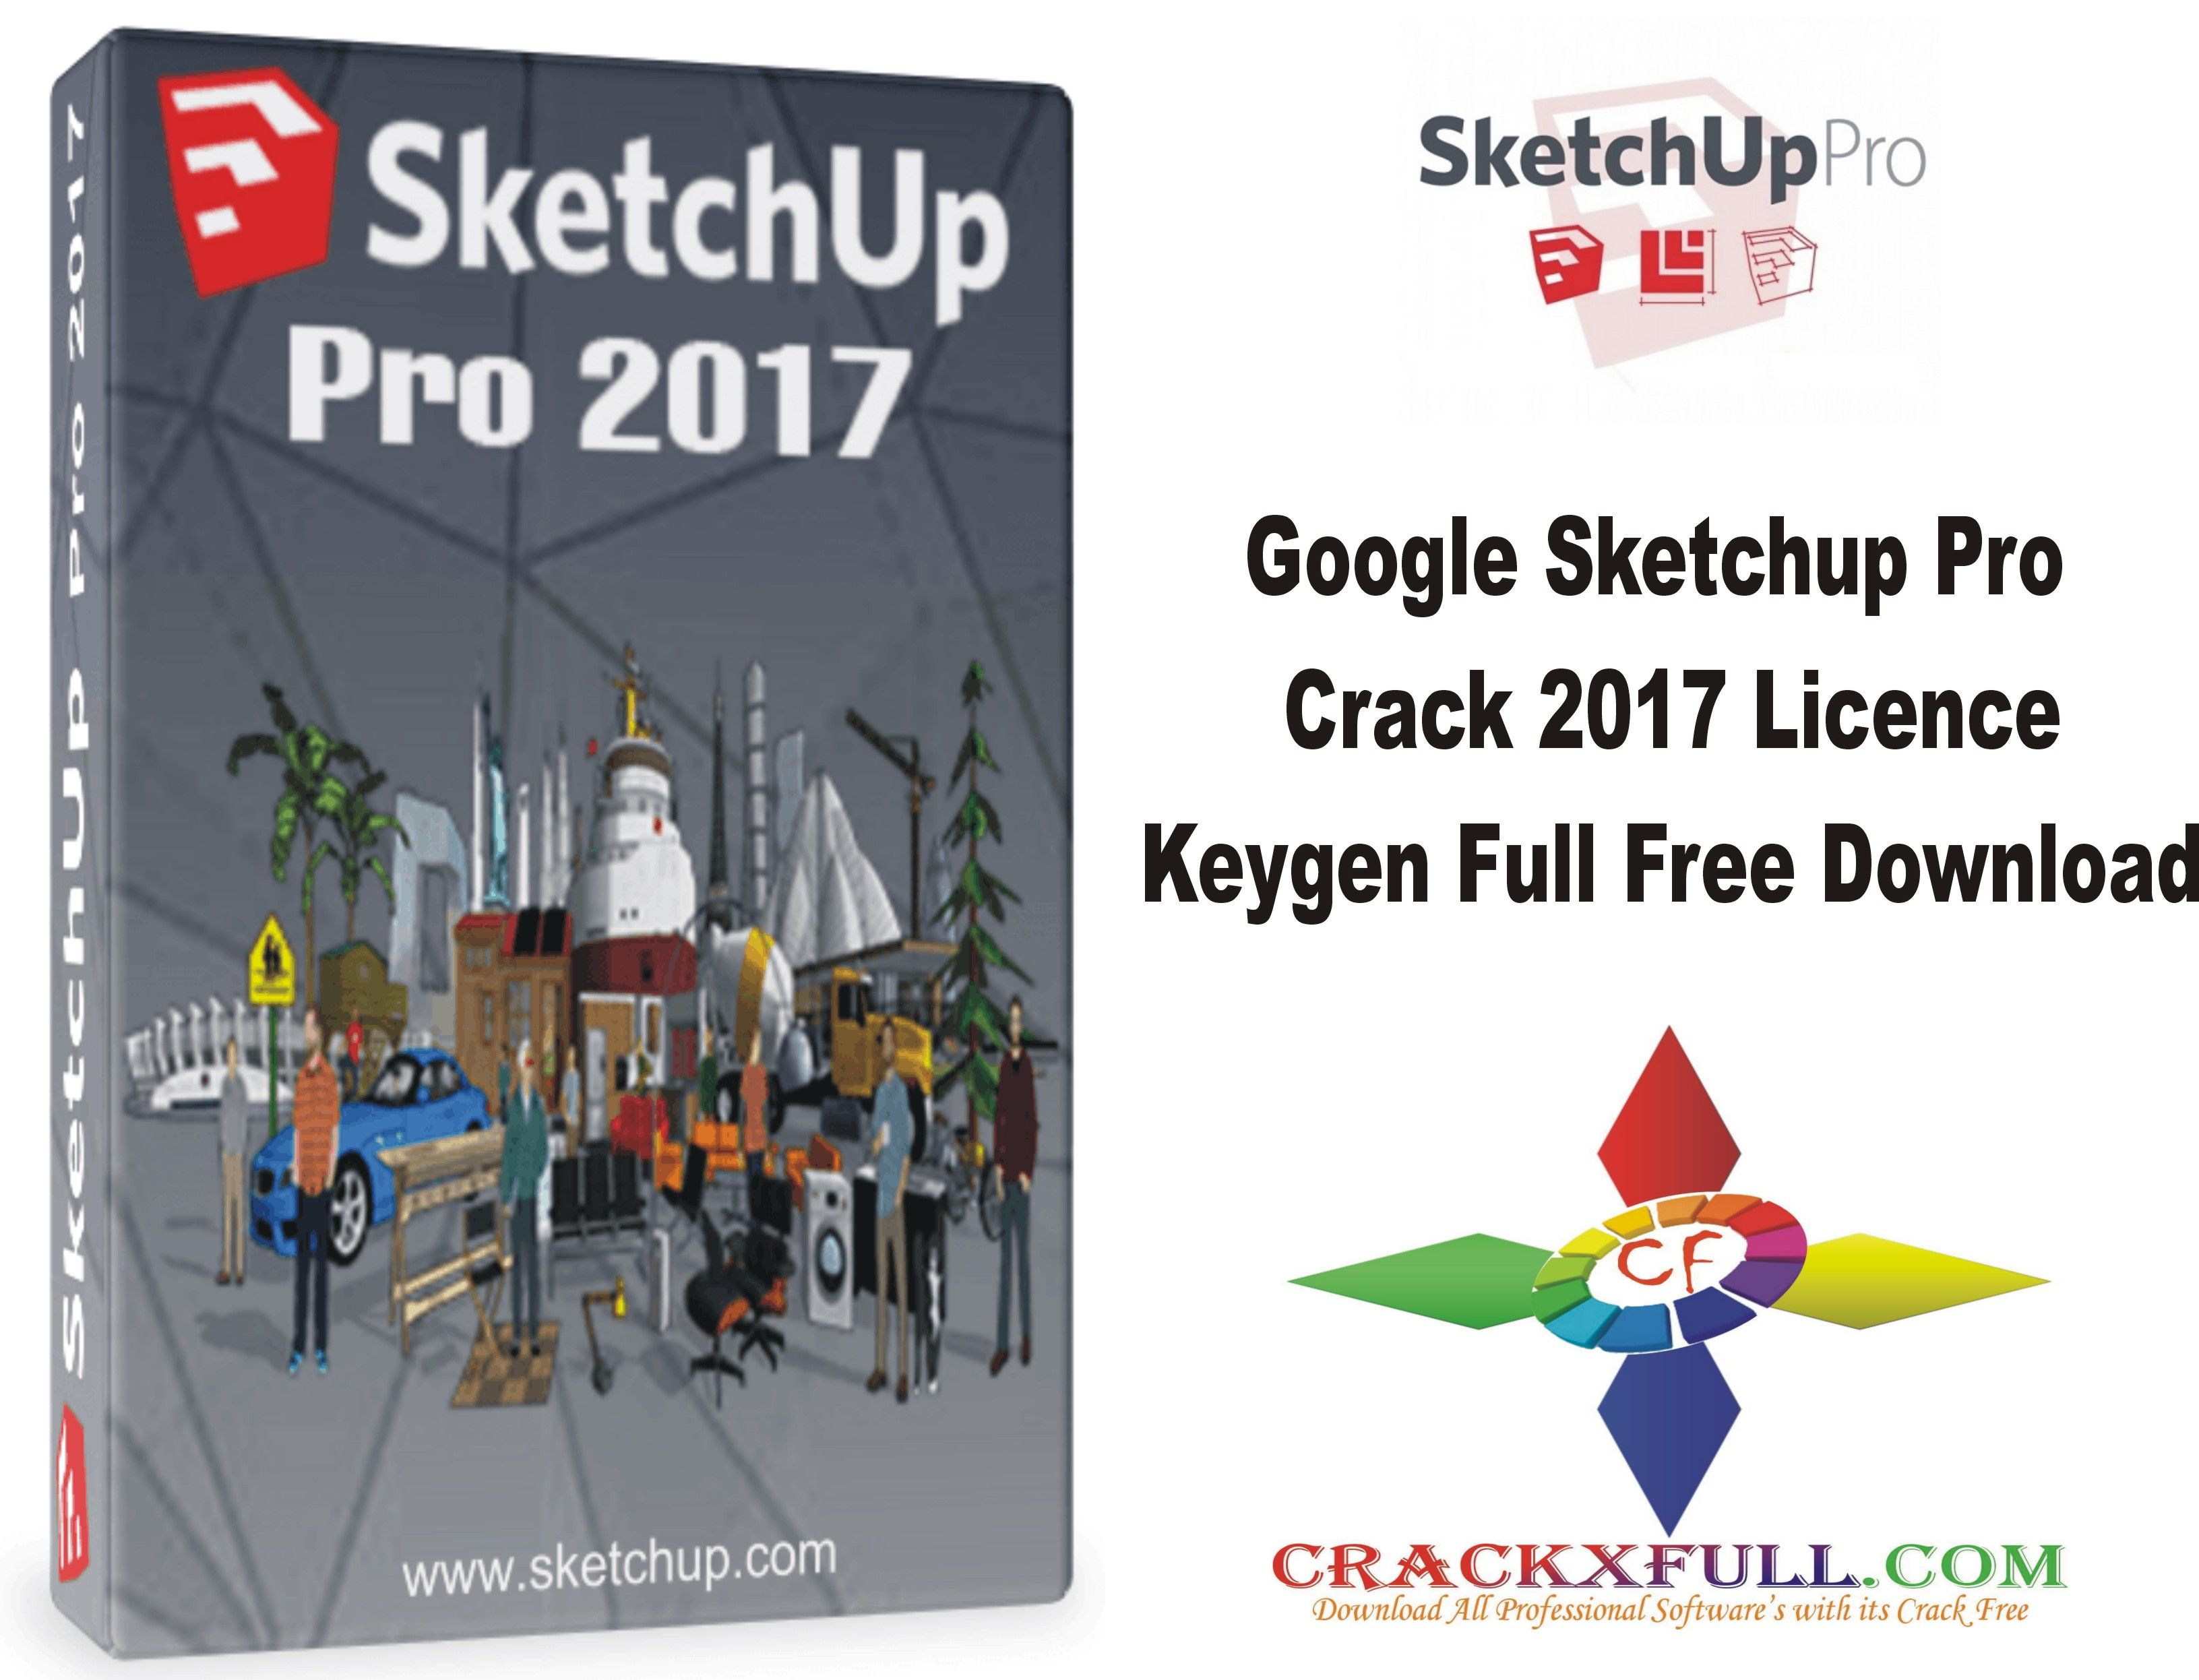 fl studio 12 4 producer edition crack full free download places google sketchup pro crack 2017 licence keygen full free download google sketchup pro crack 2017